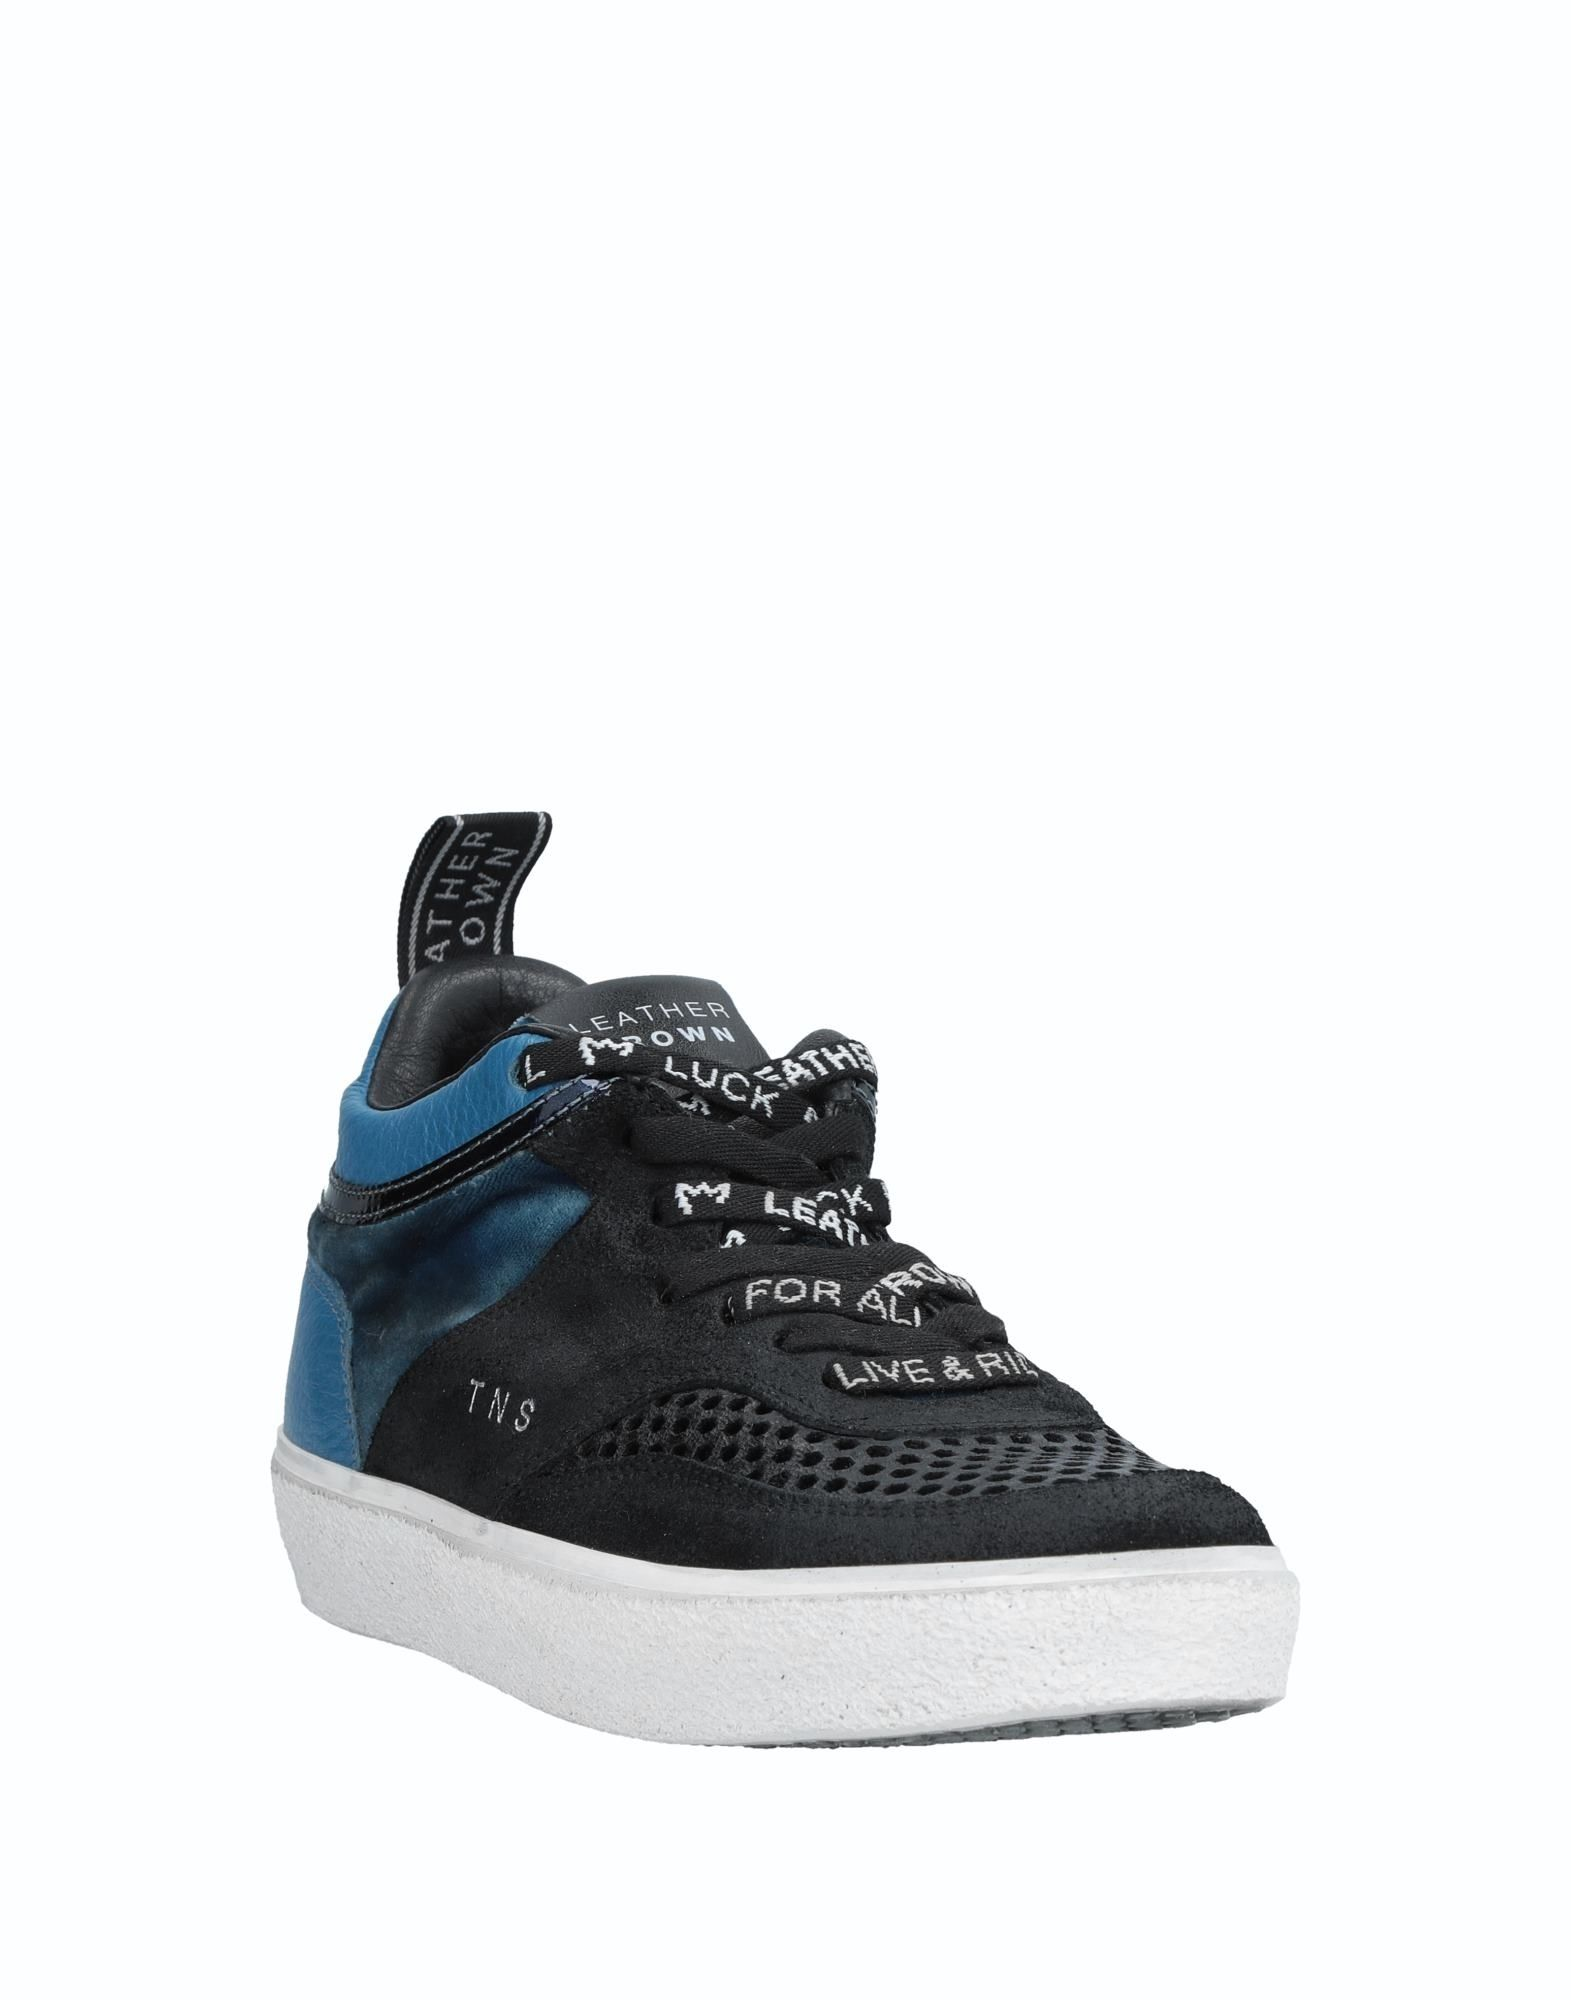 Leder Crown Sneakers Damen  11537753RS Gute Qualität beliebte beliebte beliebte Schuhe 502c8c